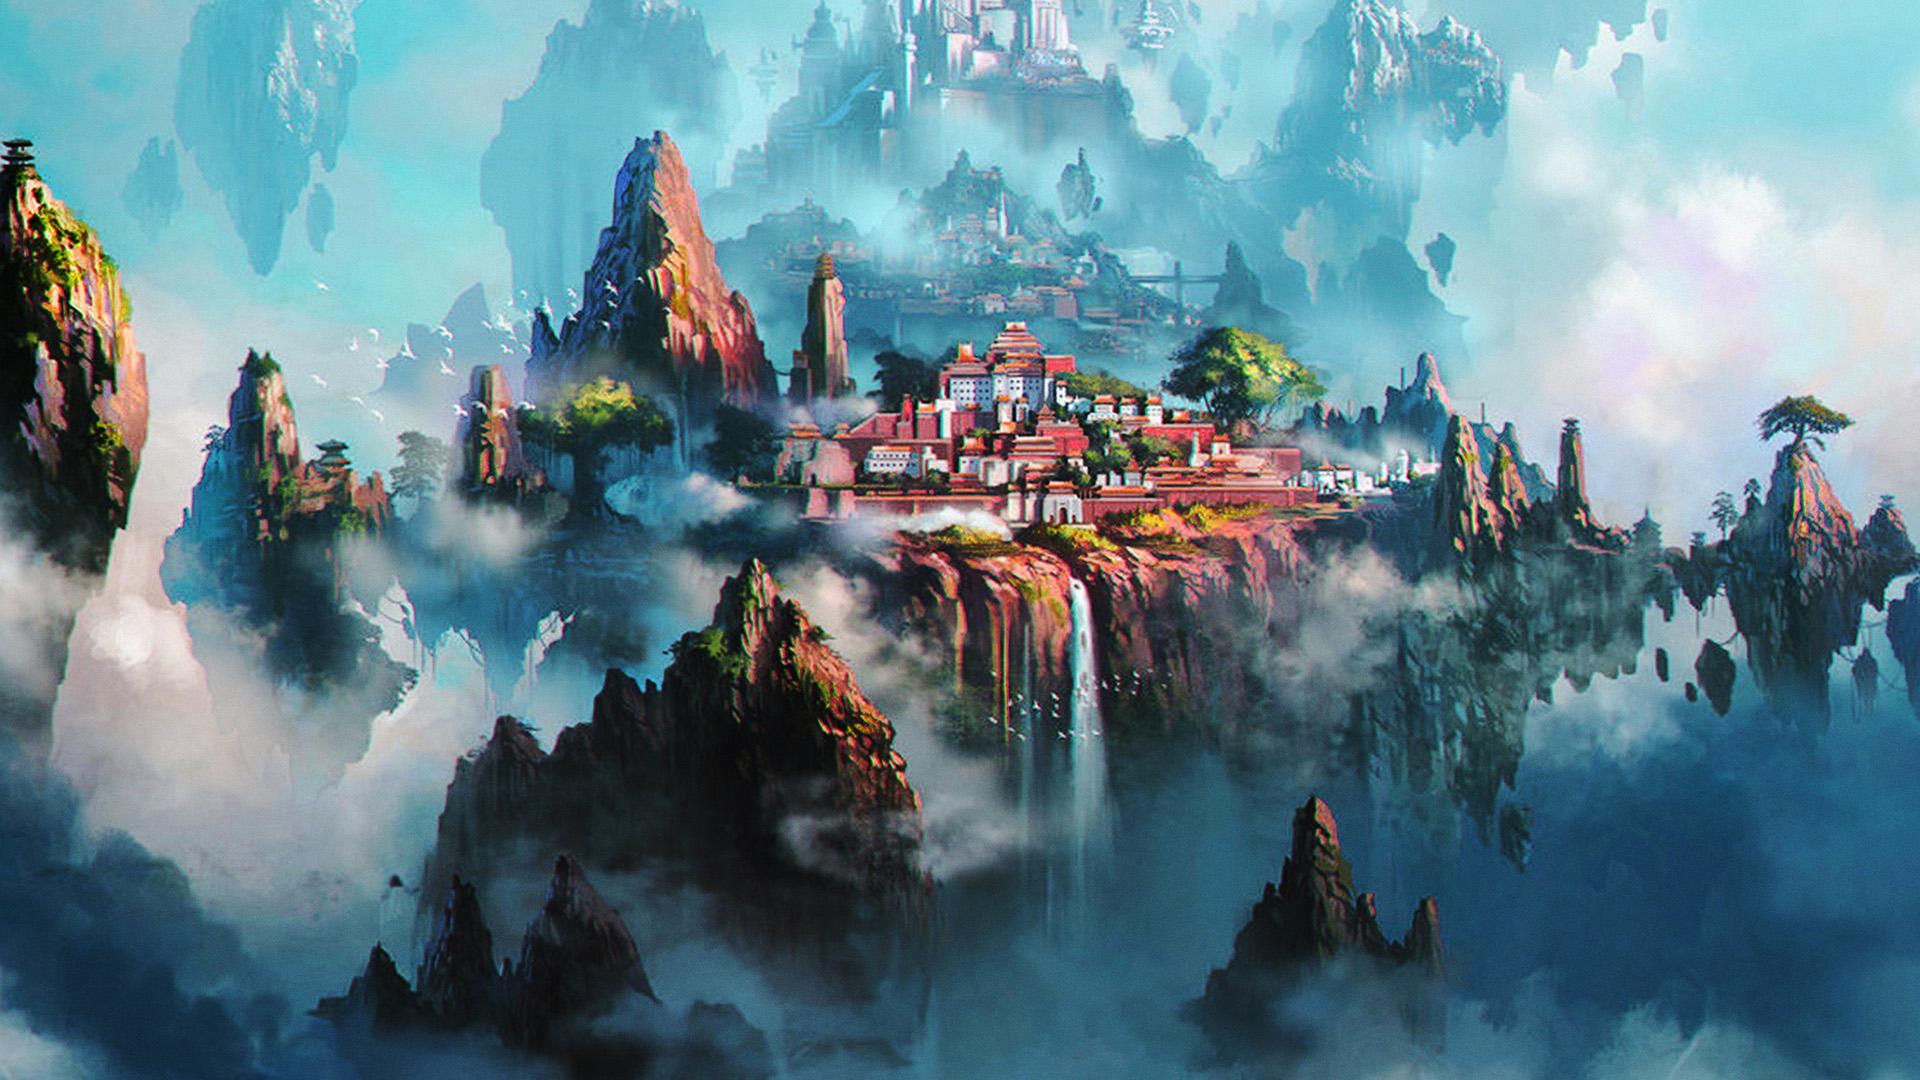 Iphone 7 Plus Anime Girls Wallpapers Av36 Cloud Town Fantasy Anime Liang Xing Illustration Art